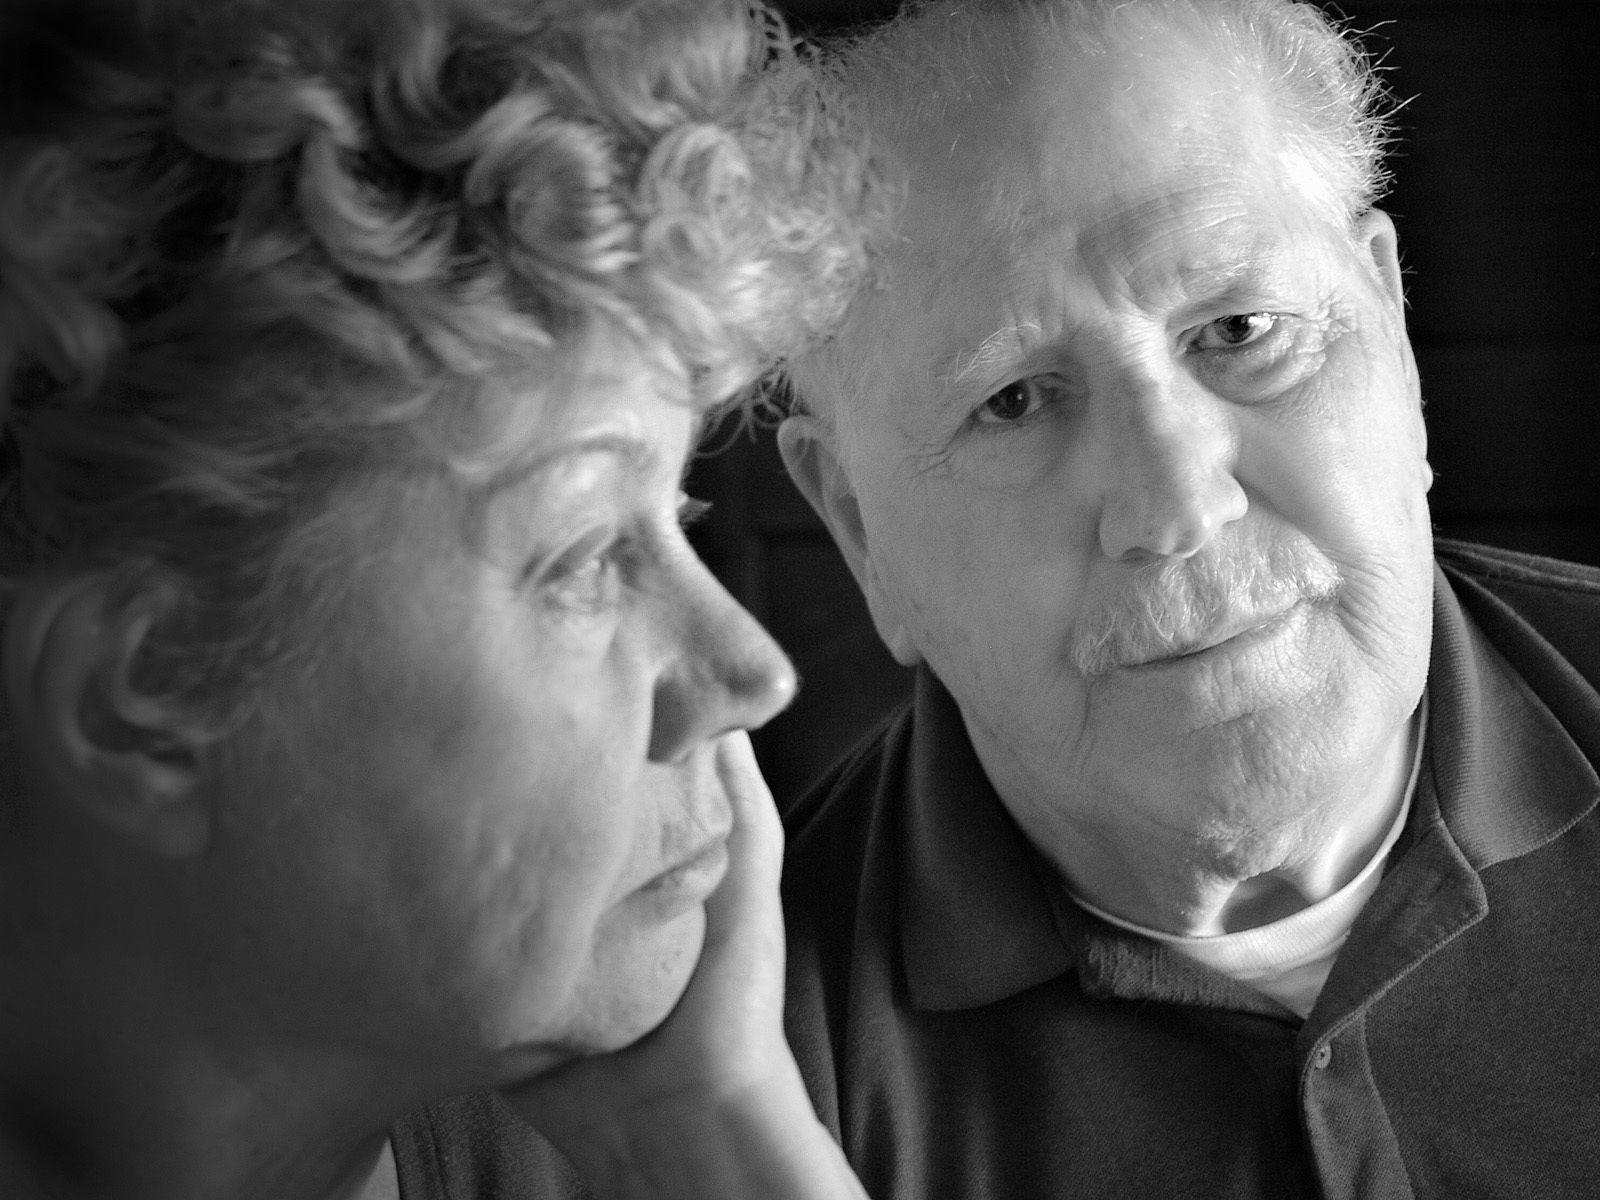 Audrey and Harry Rhyner, Oshkosh, WI, 2001